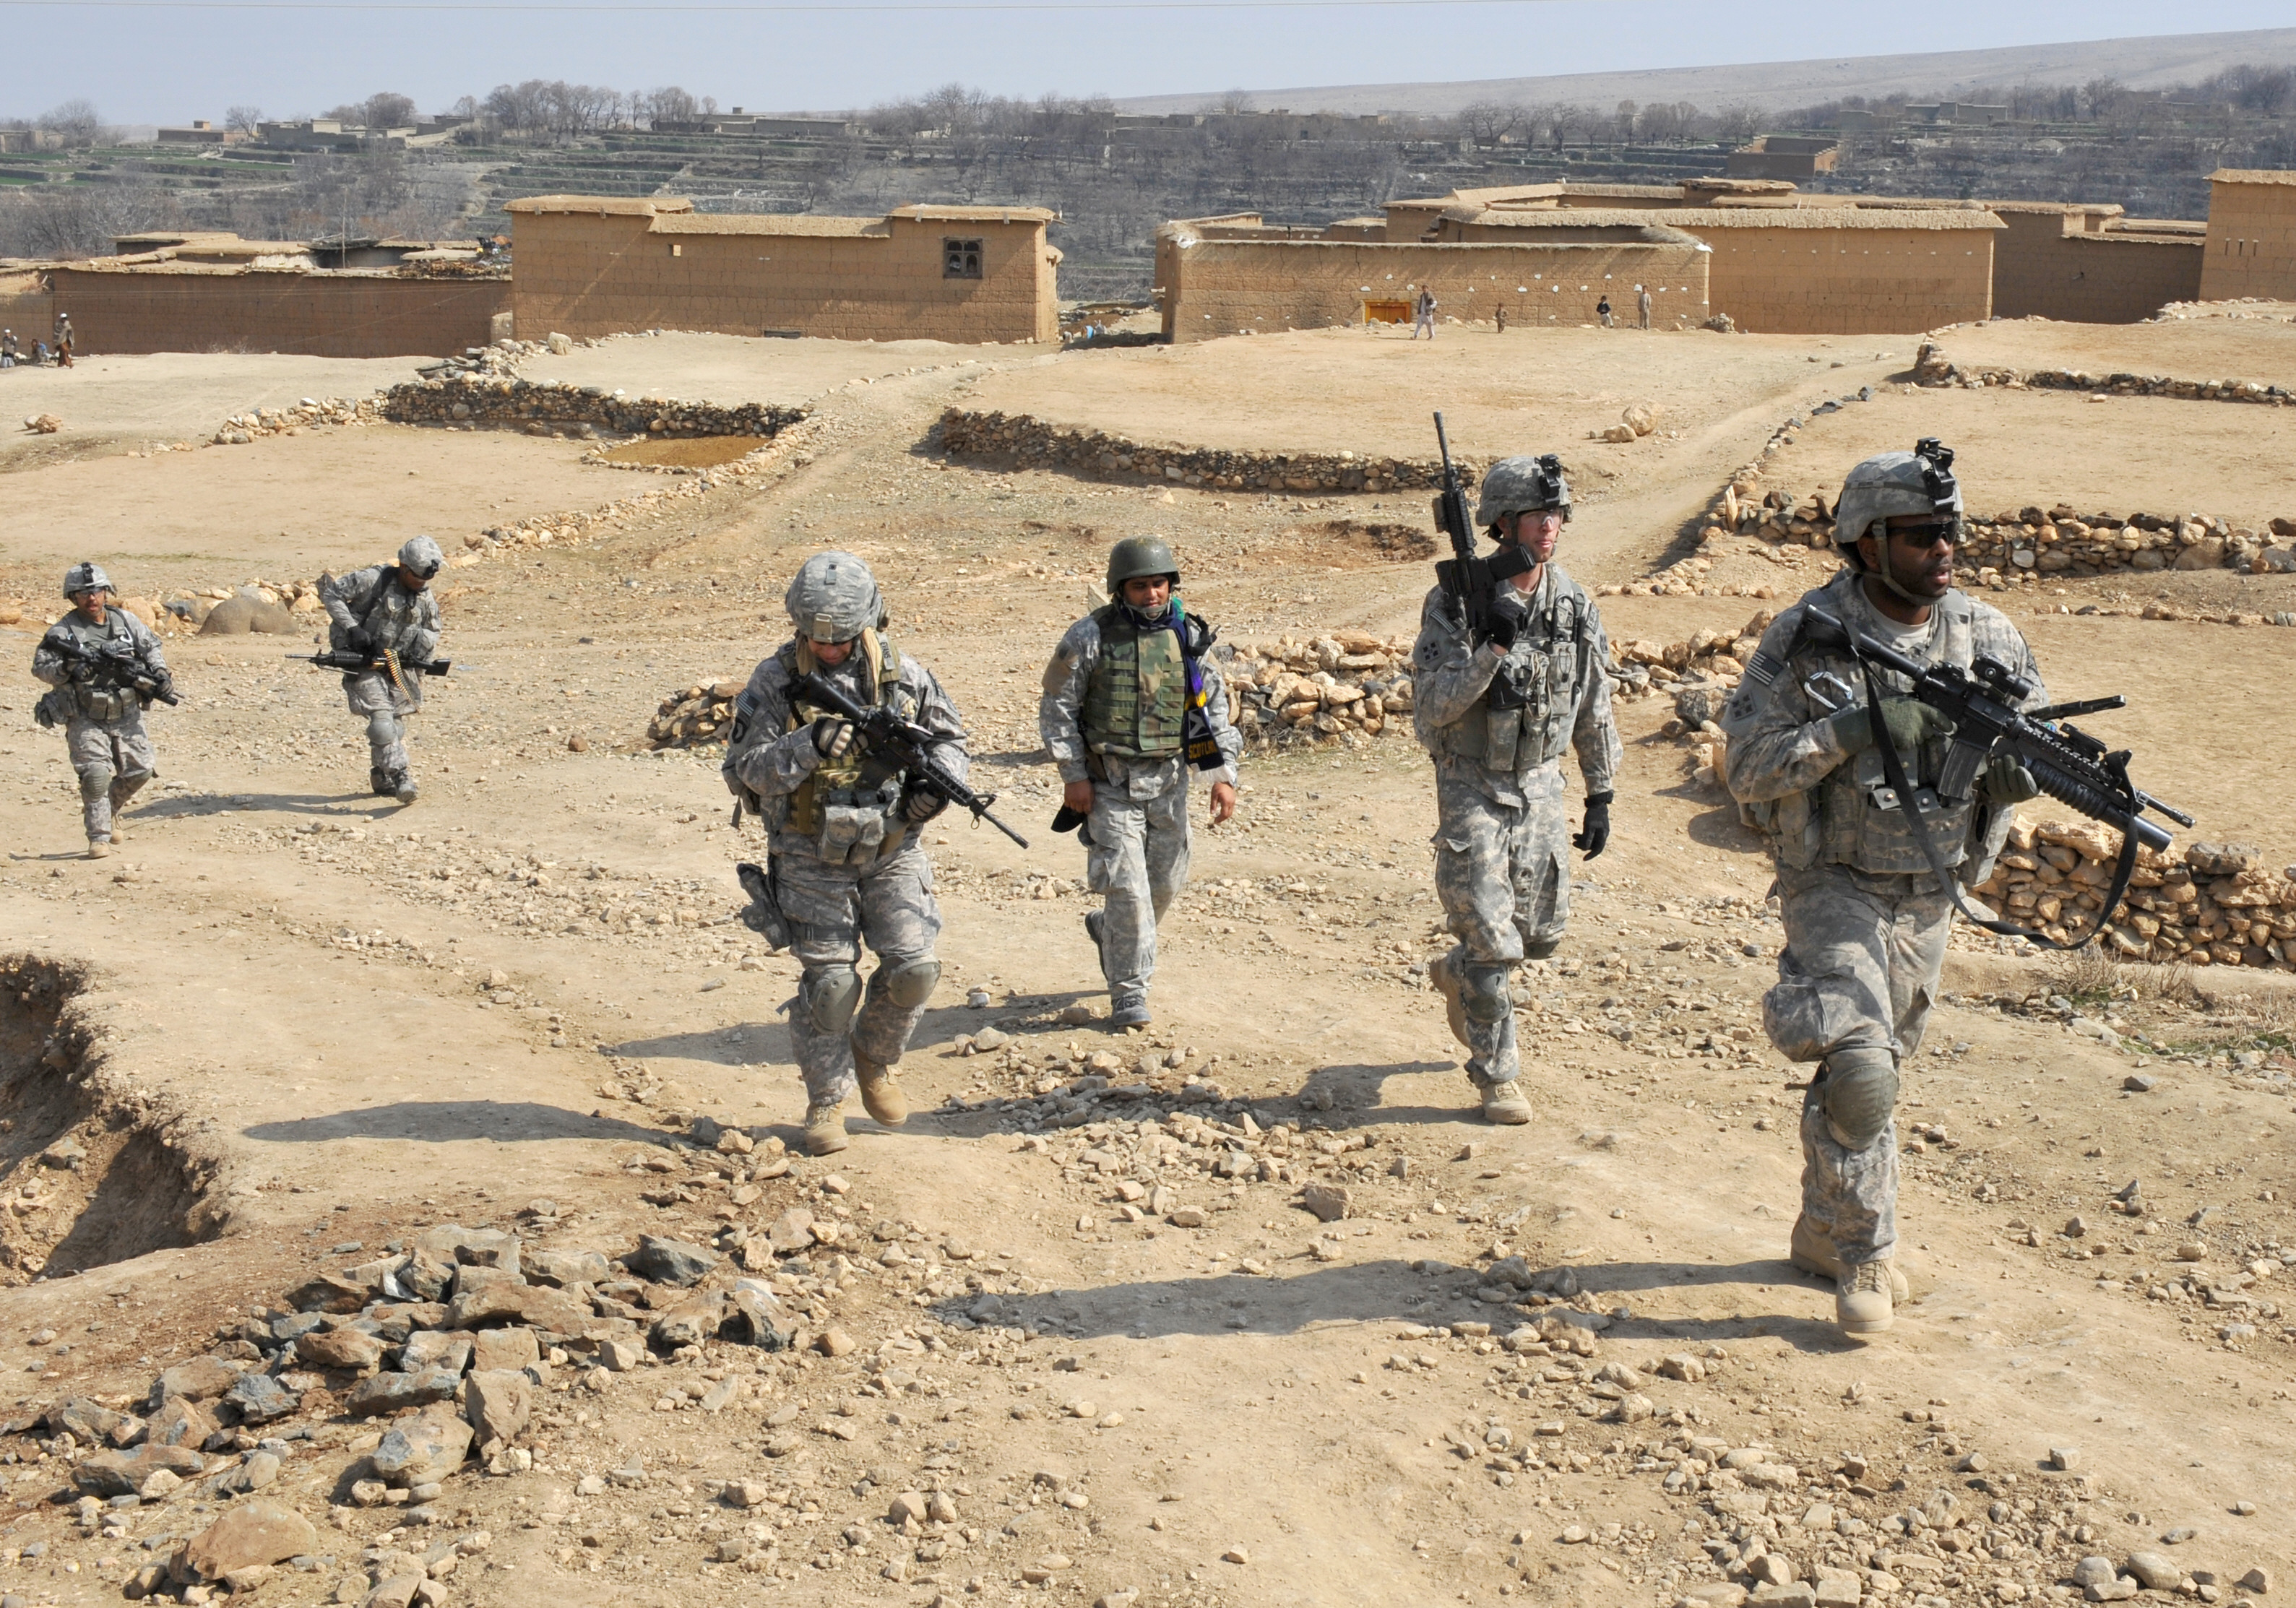 Five US soldiers patrol with an Afghan interpreter